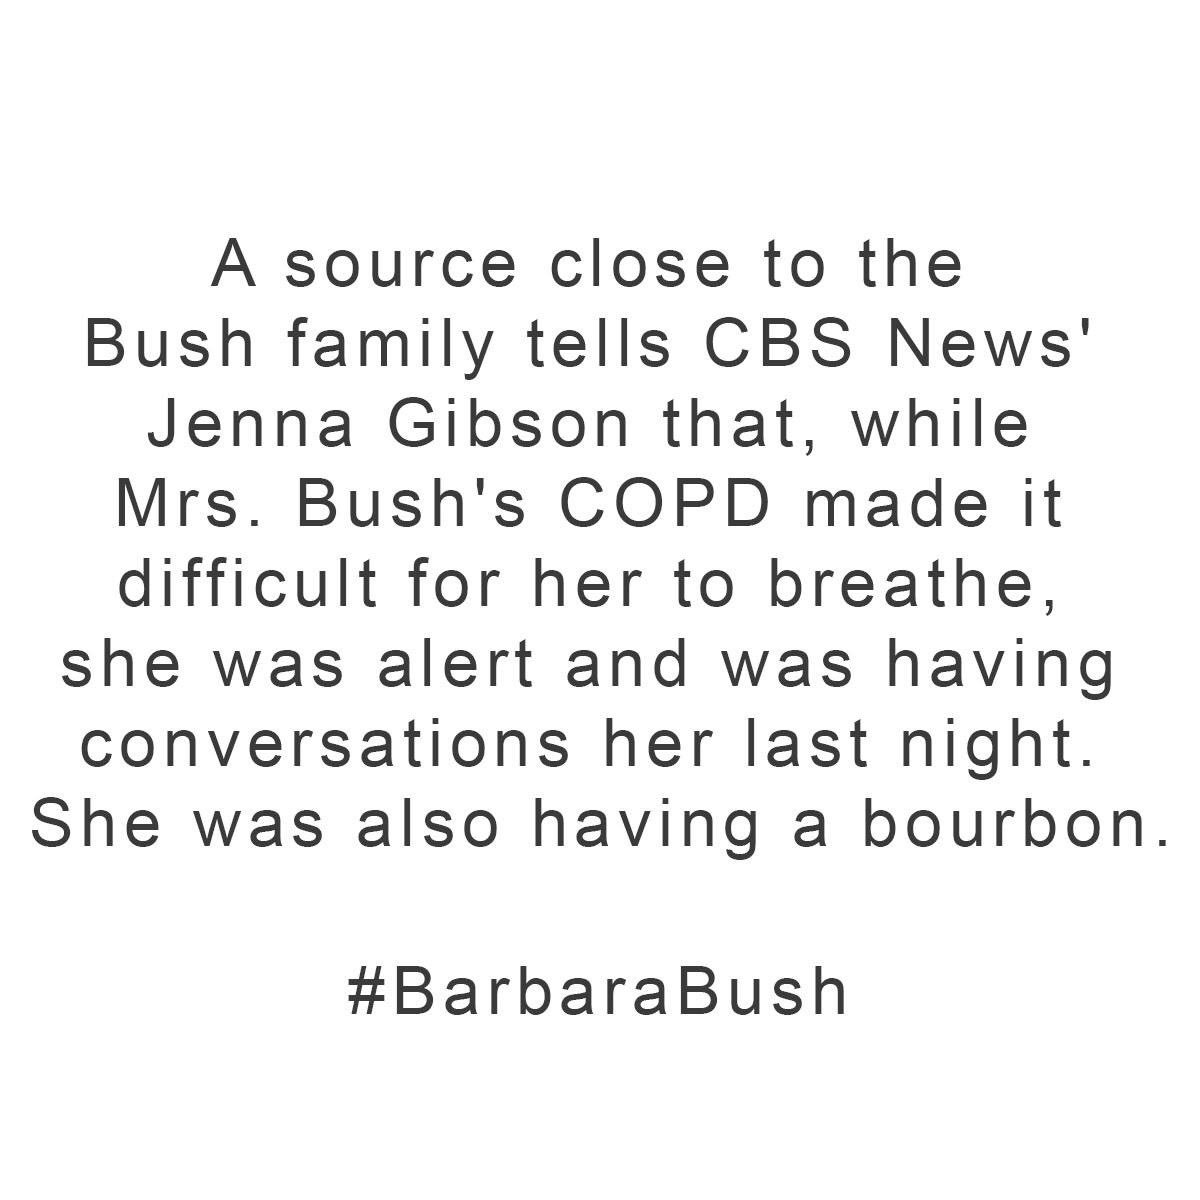 test Twitter Media - Cheers #BarbaraBush https://t.co/zujkKcMSEl